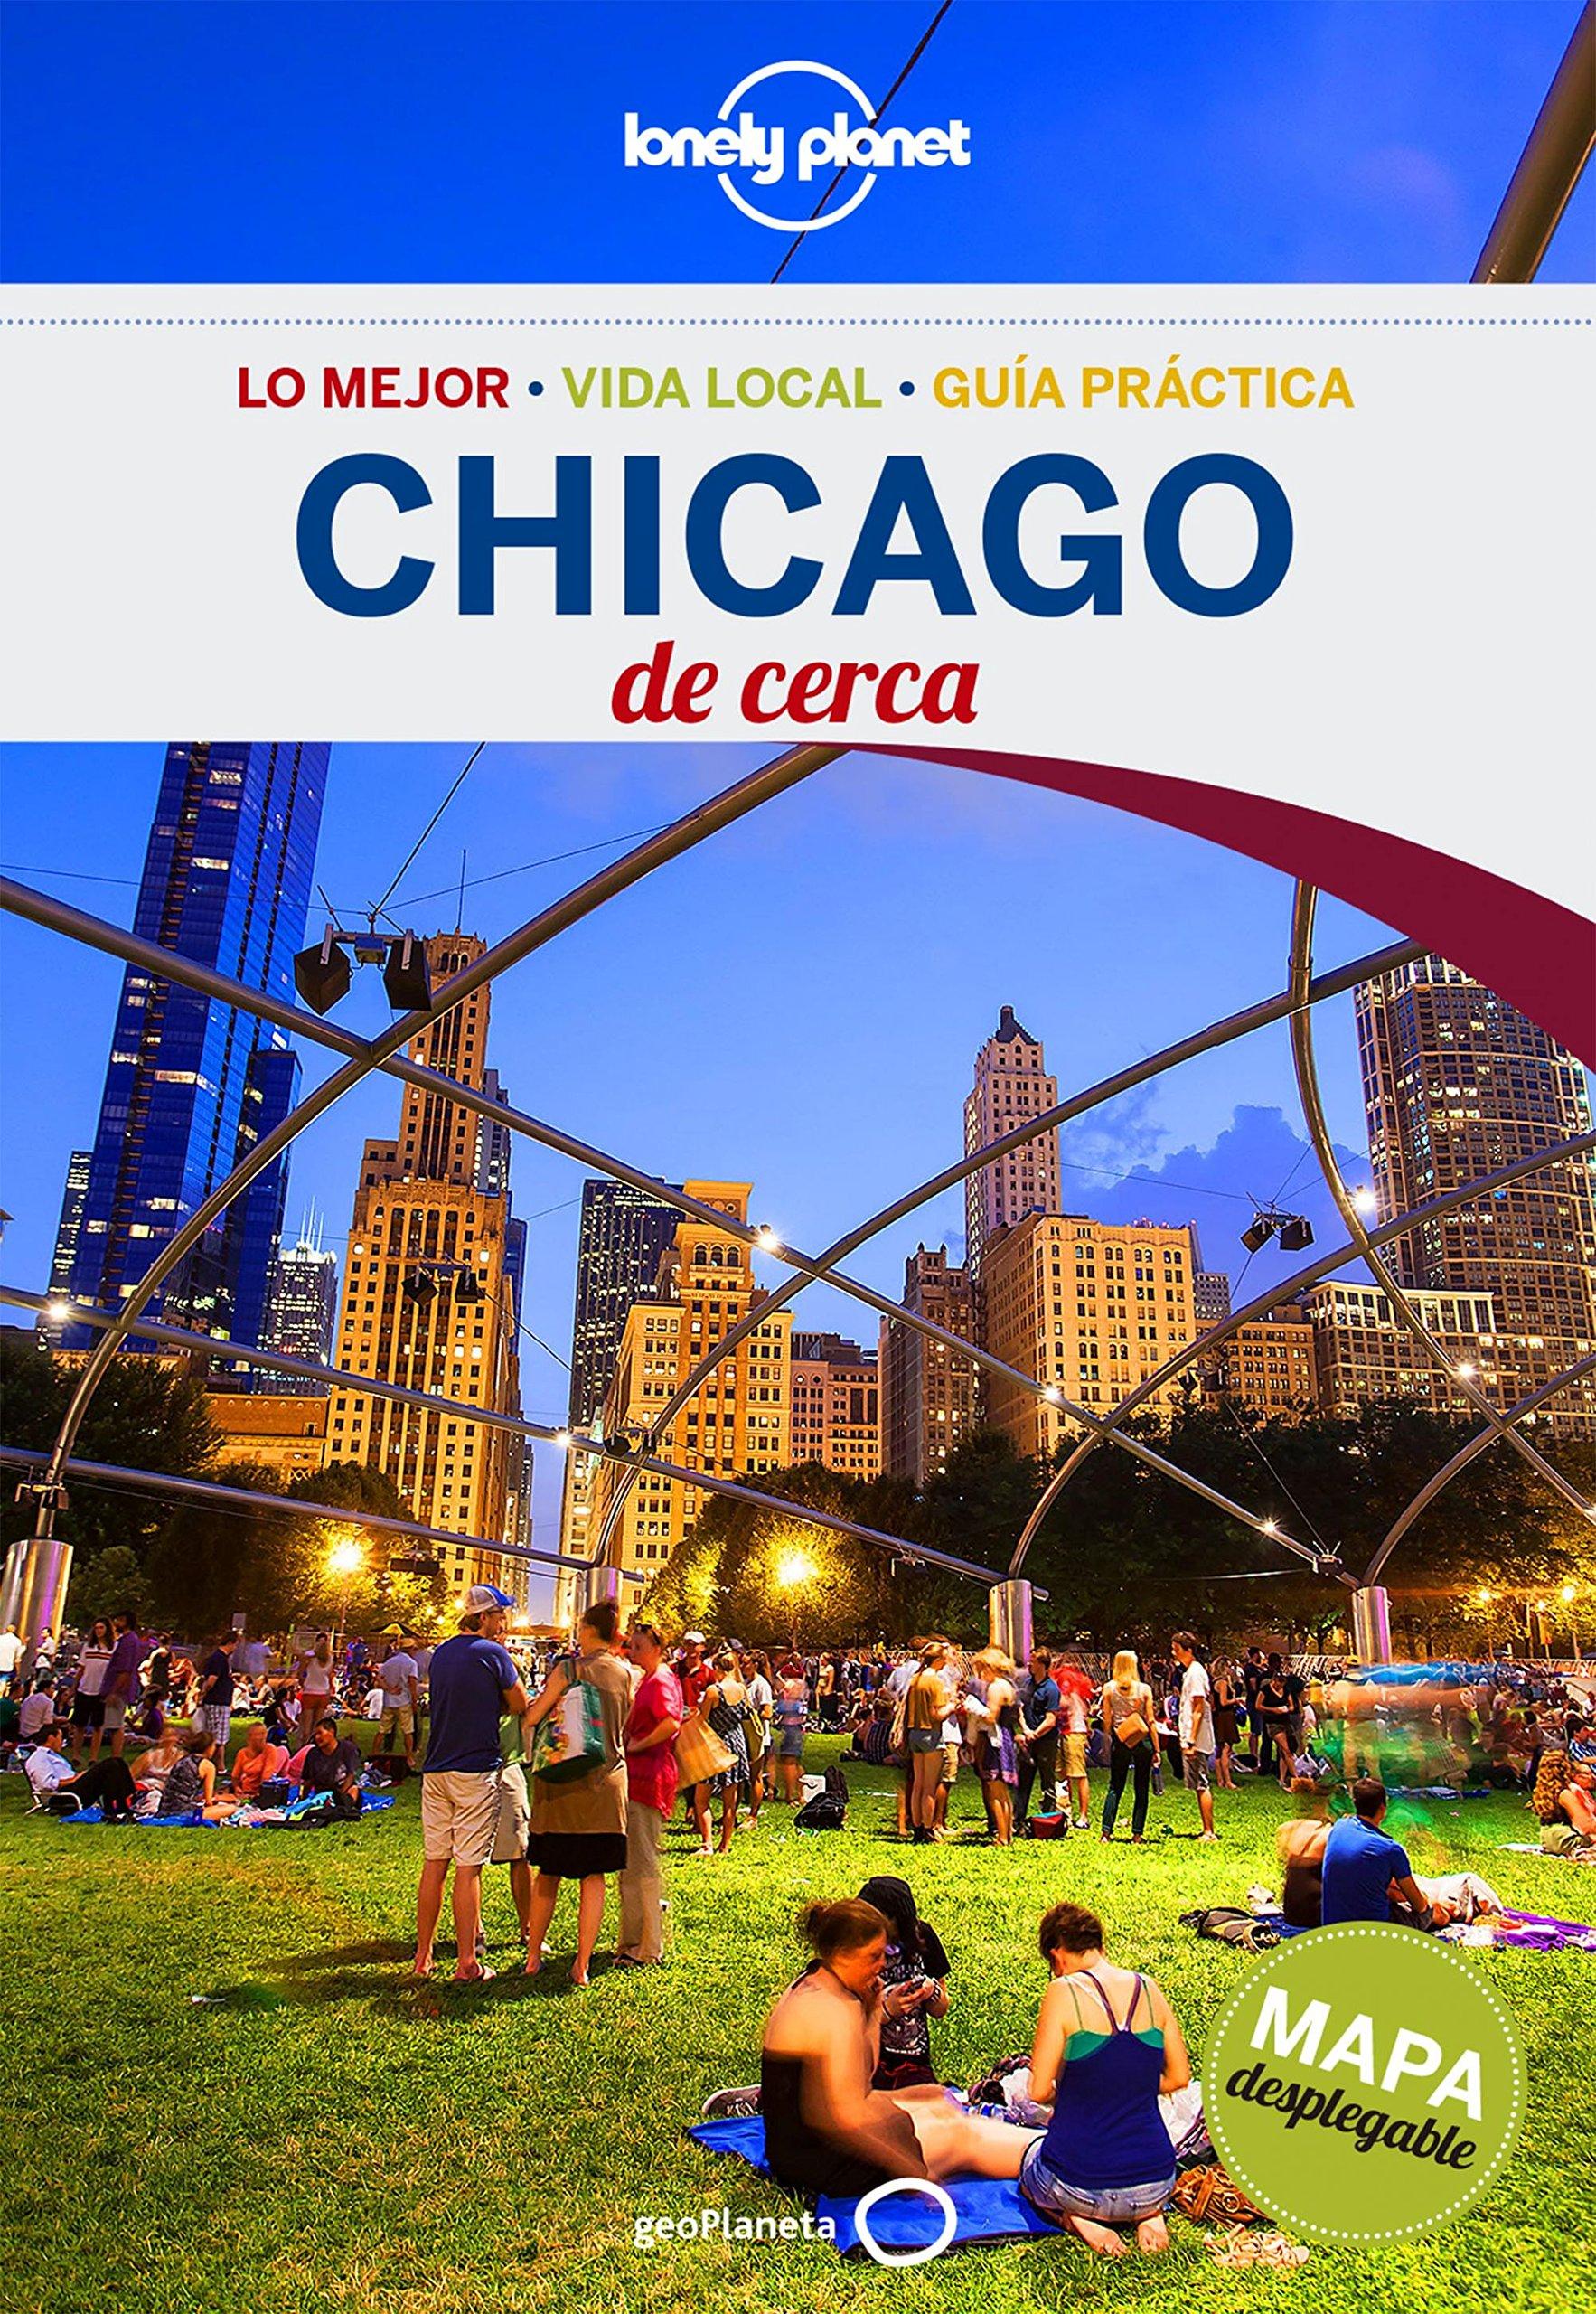 Chicago De cerca 2 (Guías De cerca Lonely Planet) Tapa blanda – 7 jun 2016 Karla Zimmerman Gemma Salvà Jorge García García GeoPlaneta